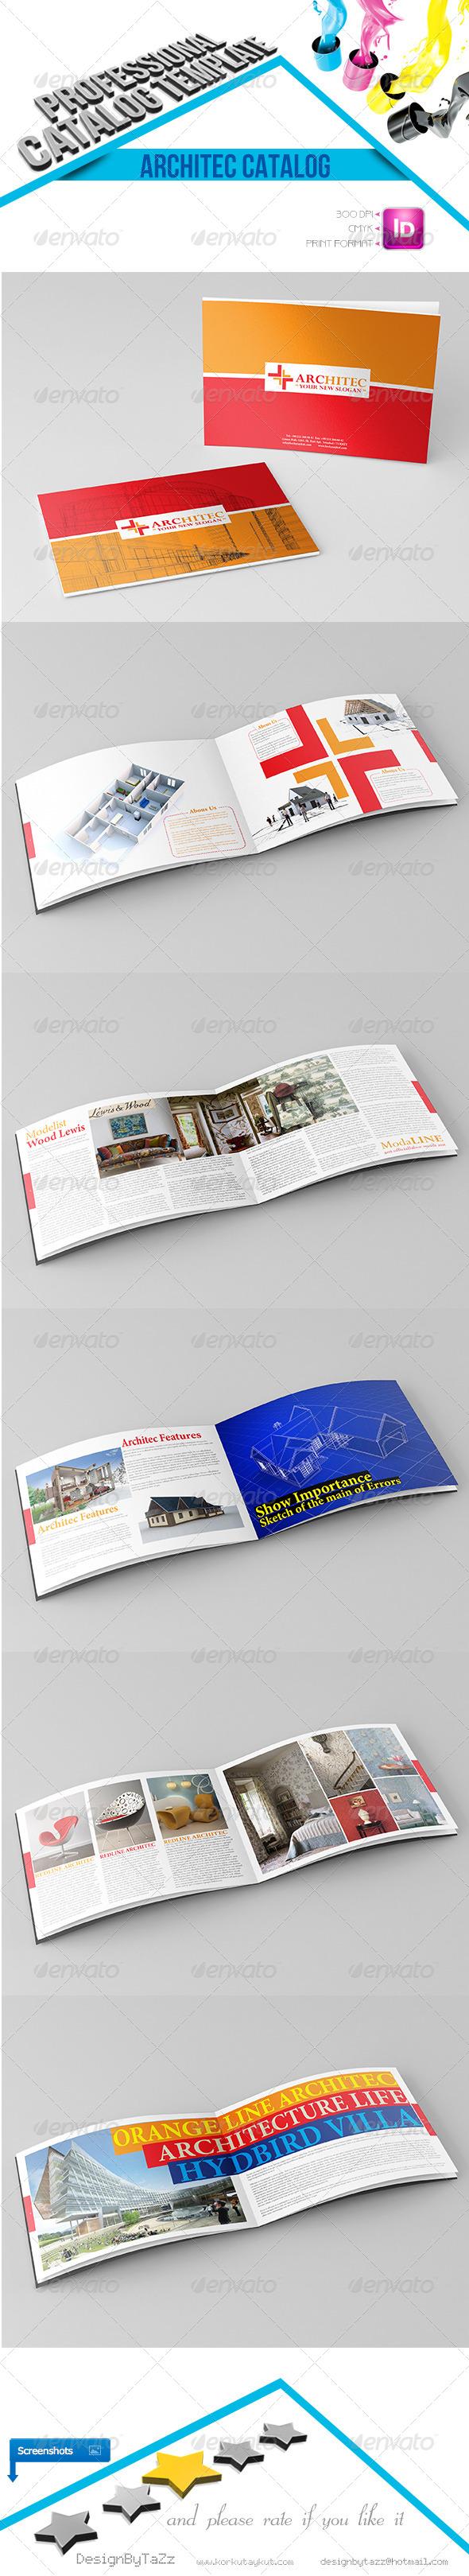 Architec Corporate Identity Catalog - Catalogs Brochures